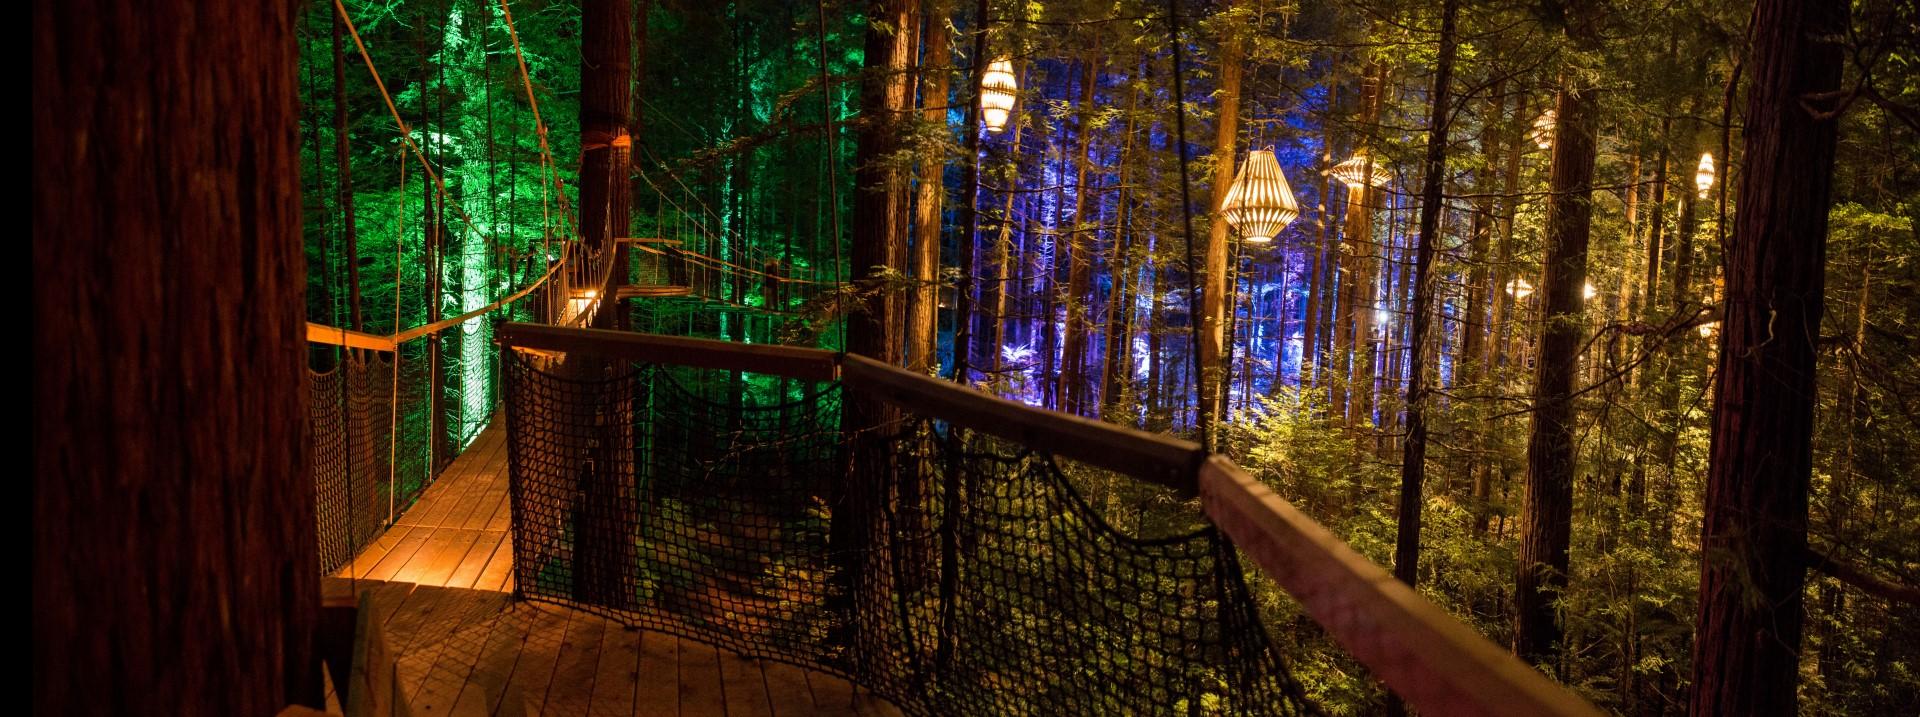 Magical nights at Treewalk Rotorua